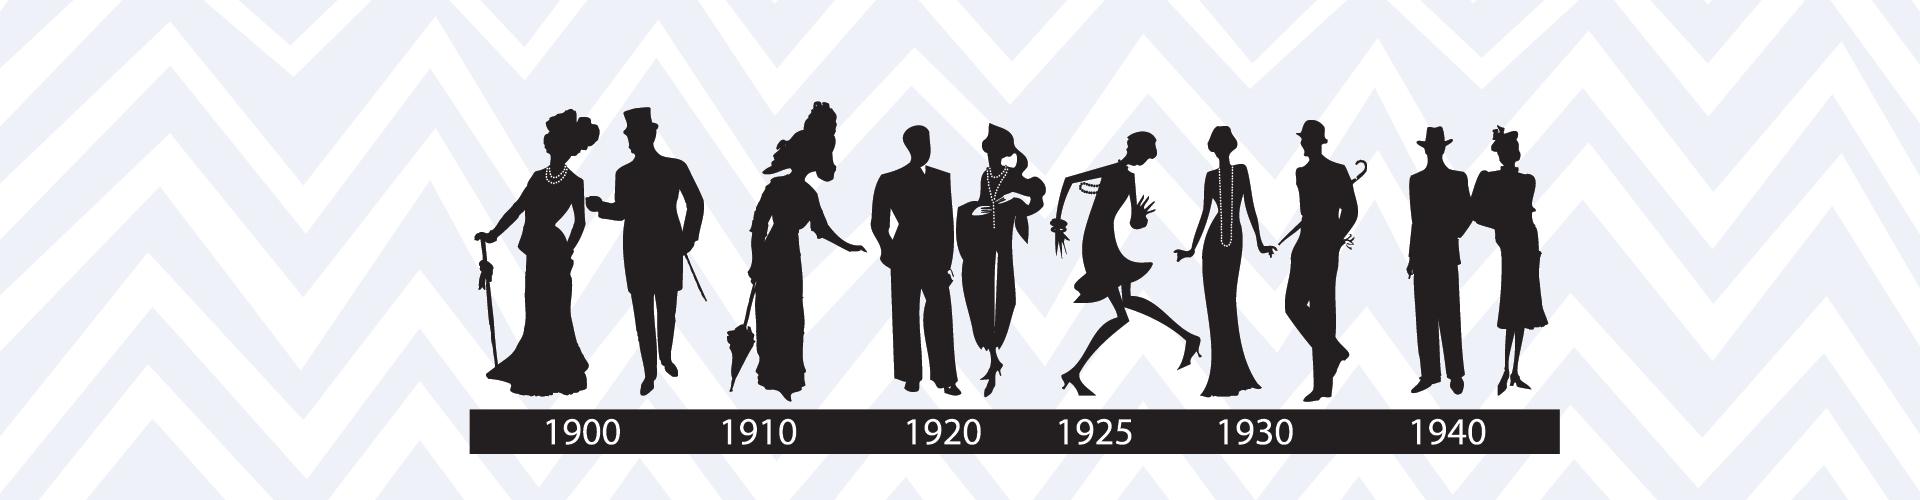 1900 to 1940